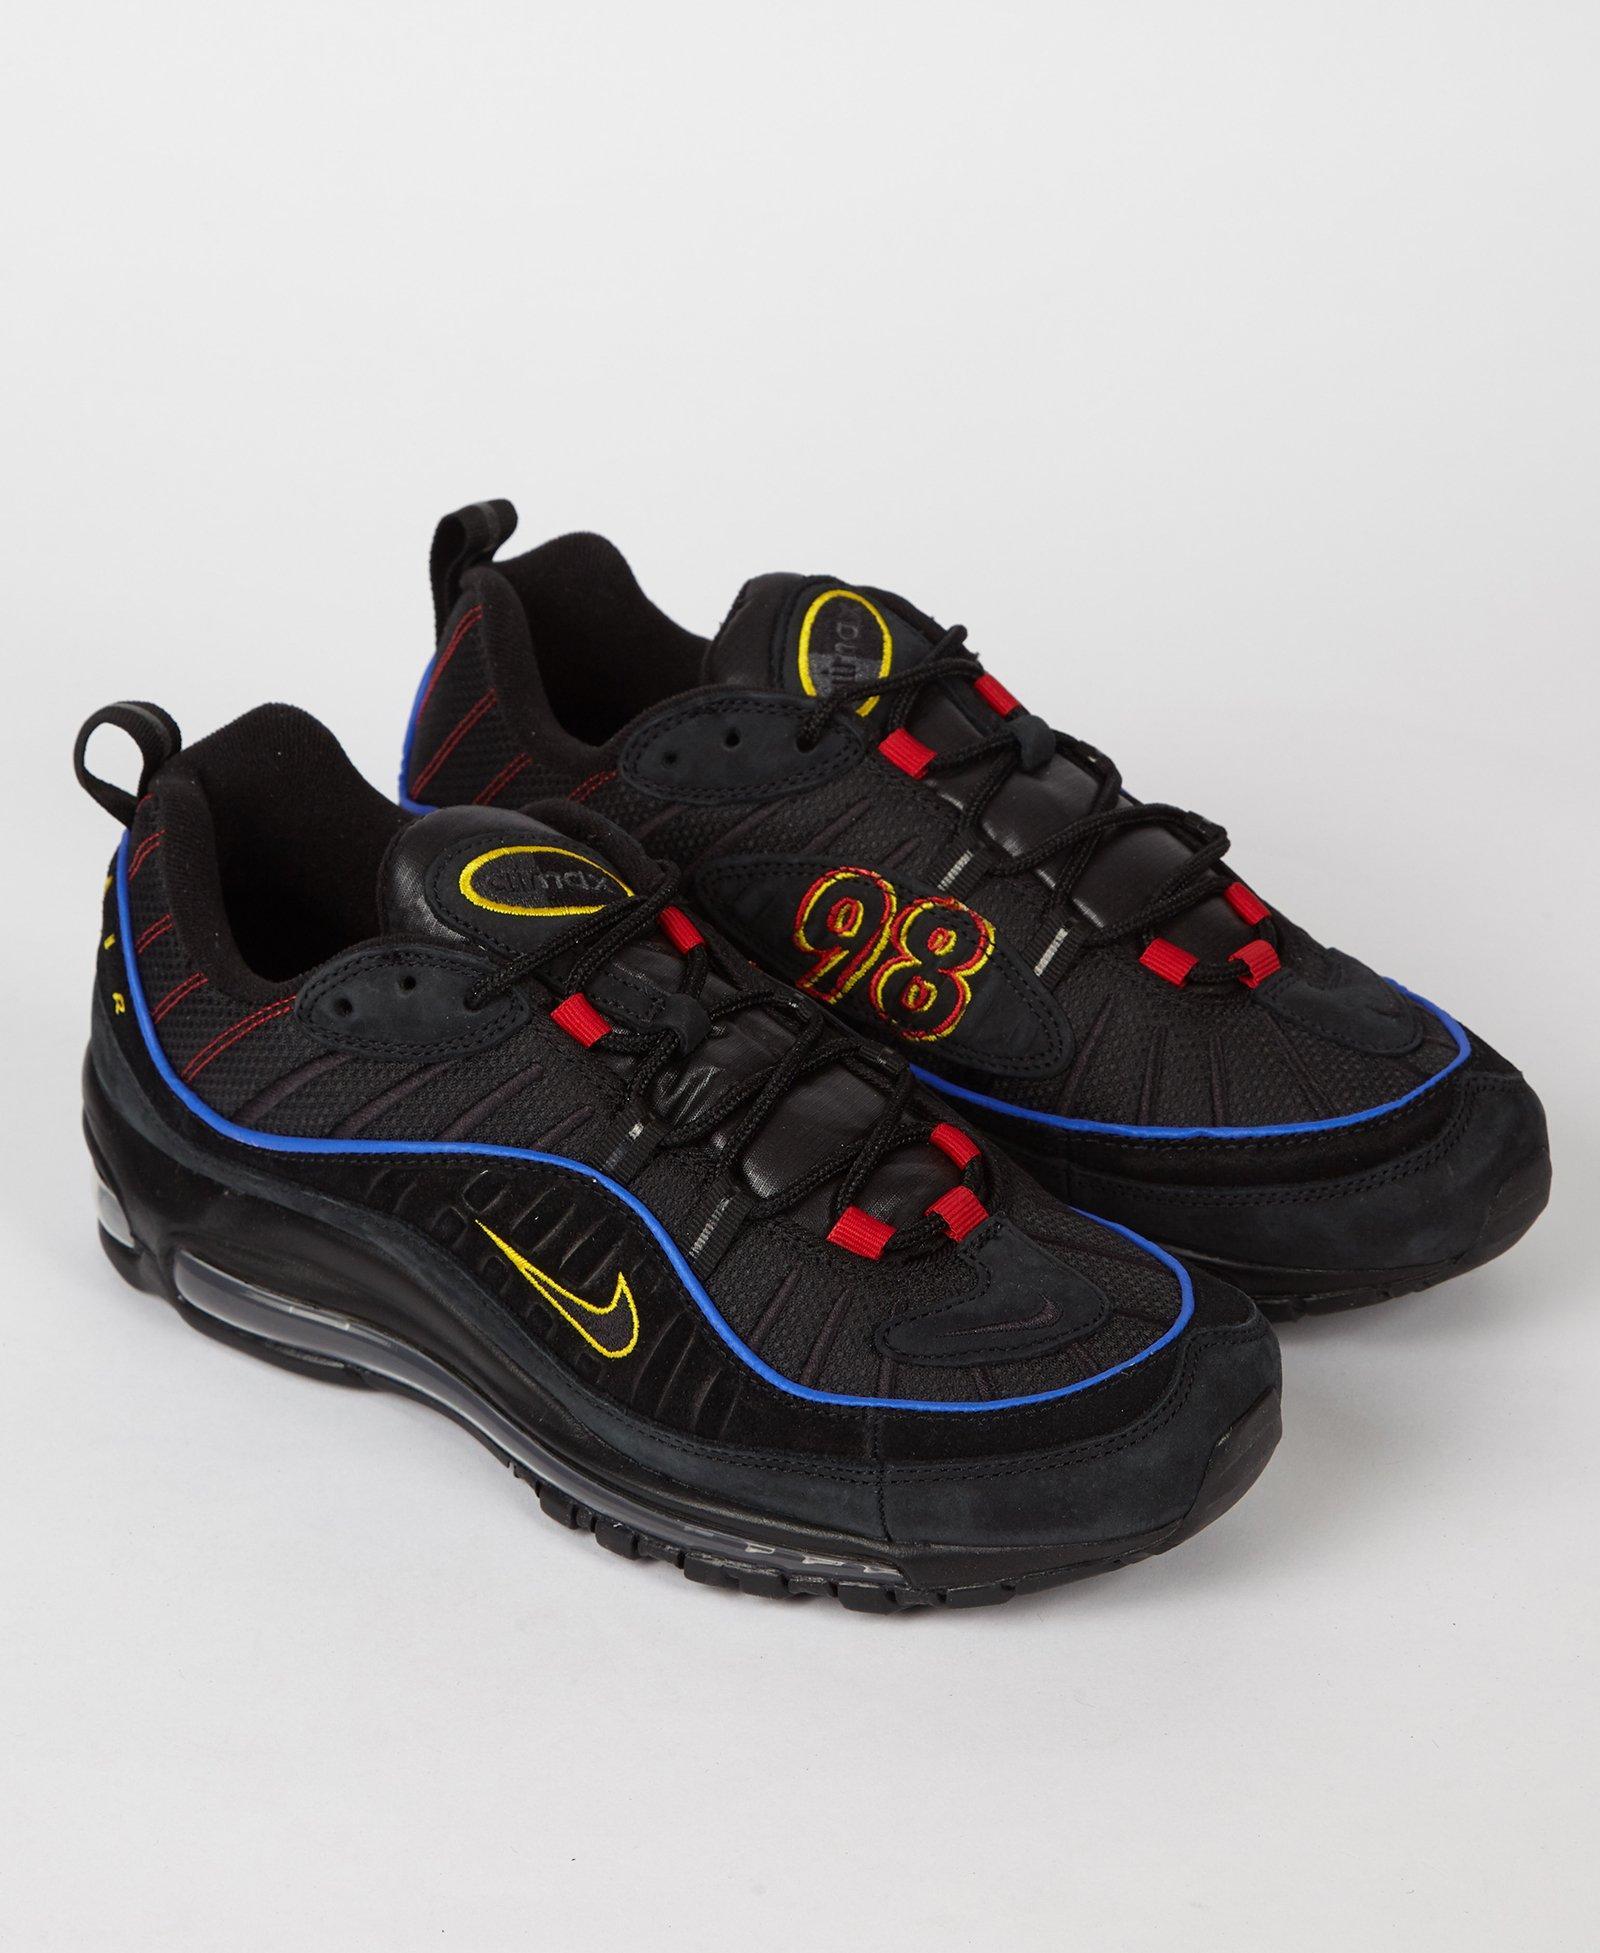 248ae8dfbfb4 Lyst - Nike Air Max 98  amarillo  in Black for Men